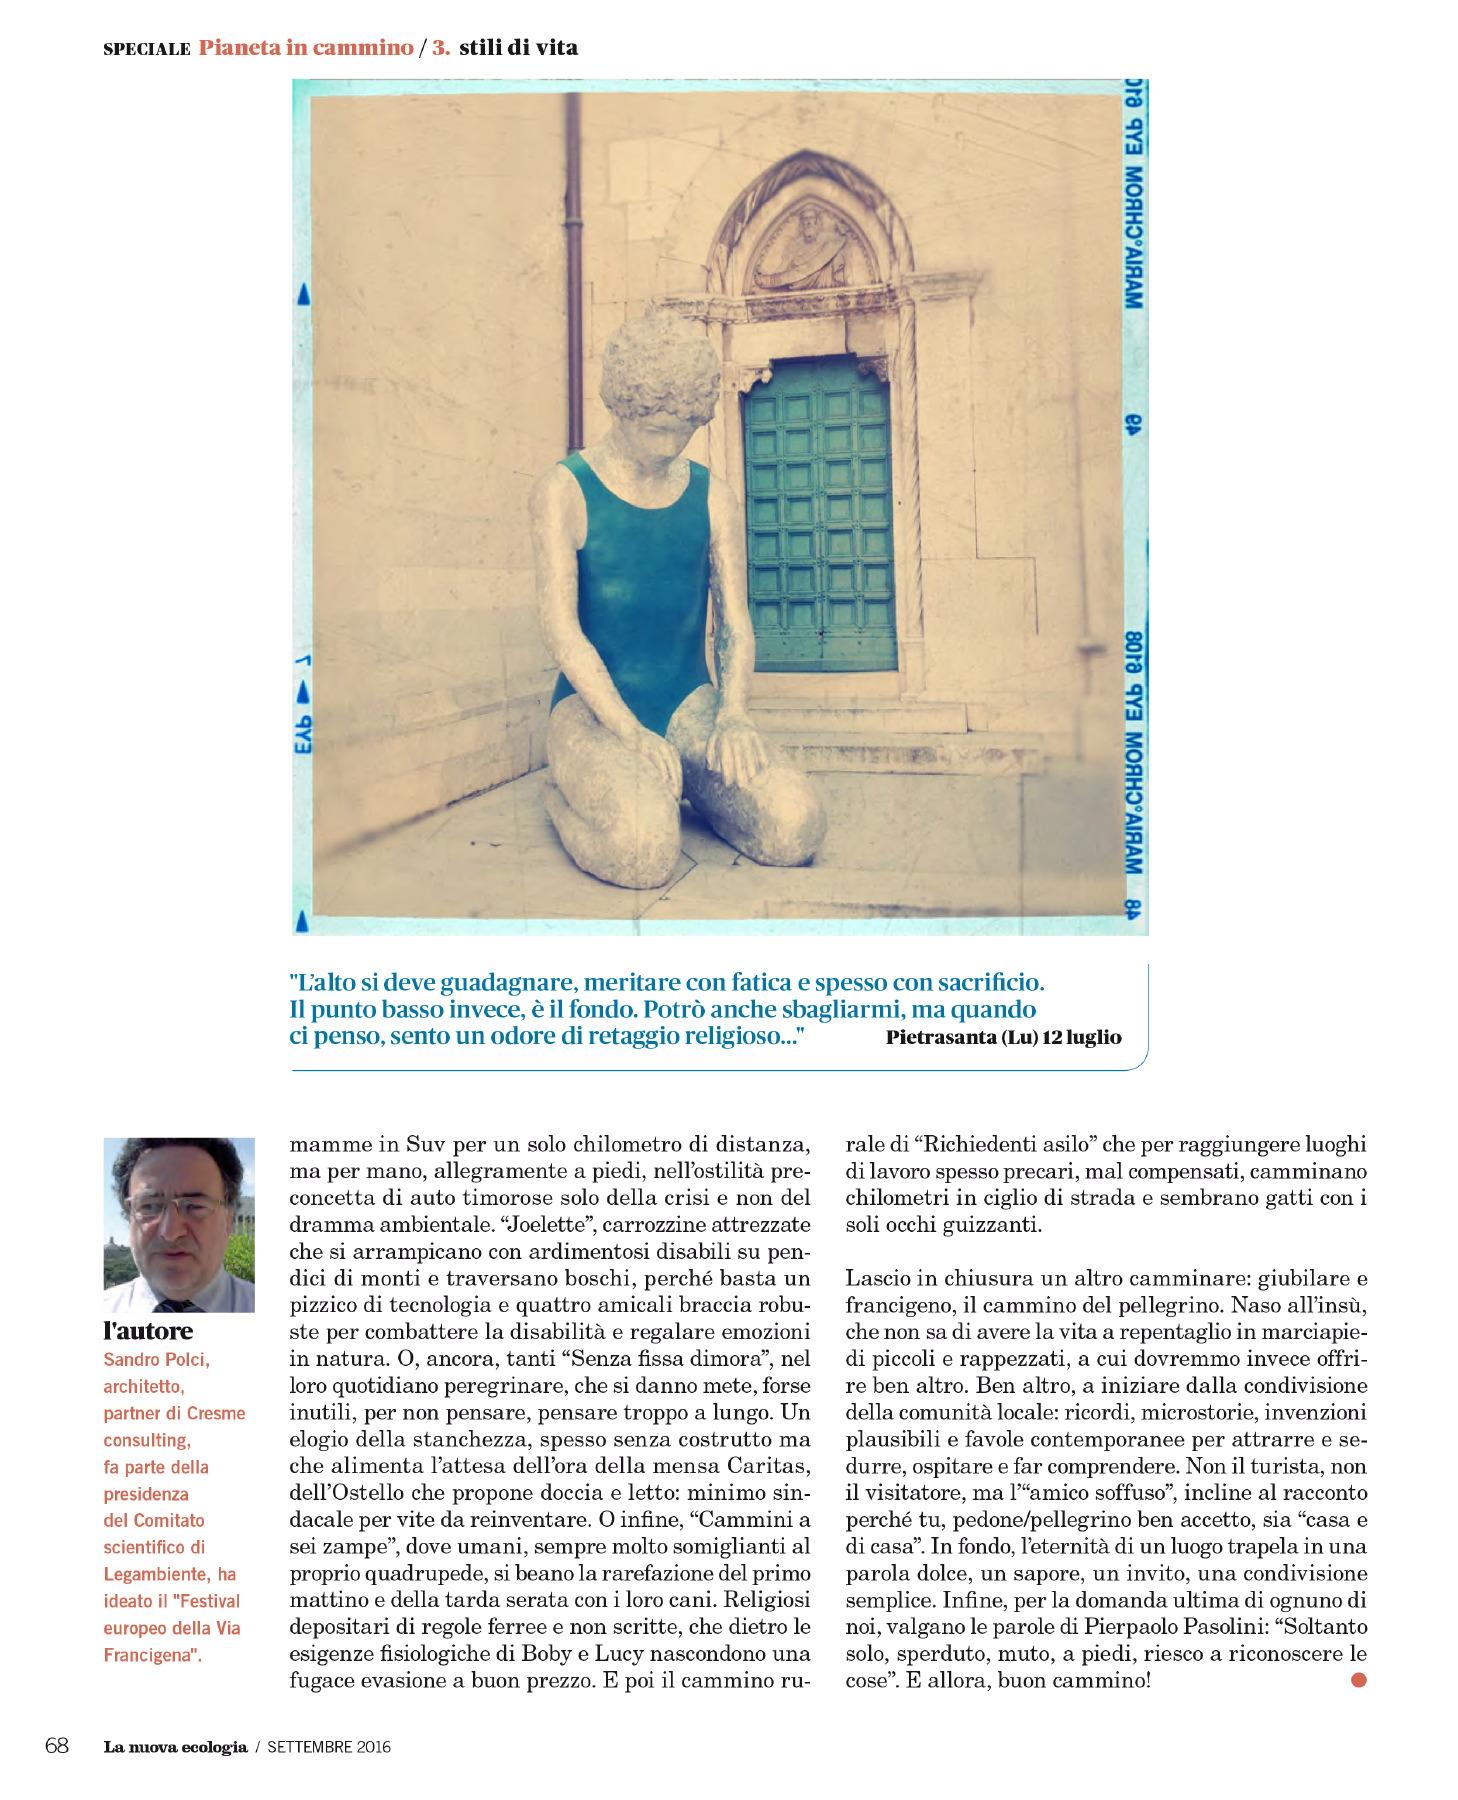 around-the-walk-_-pietro-vertamy-_tearsheet-nuova-ecologia-07